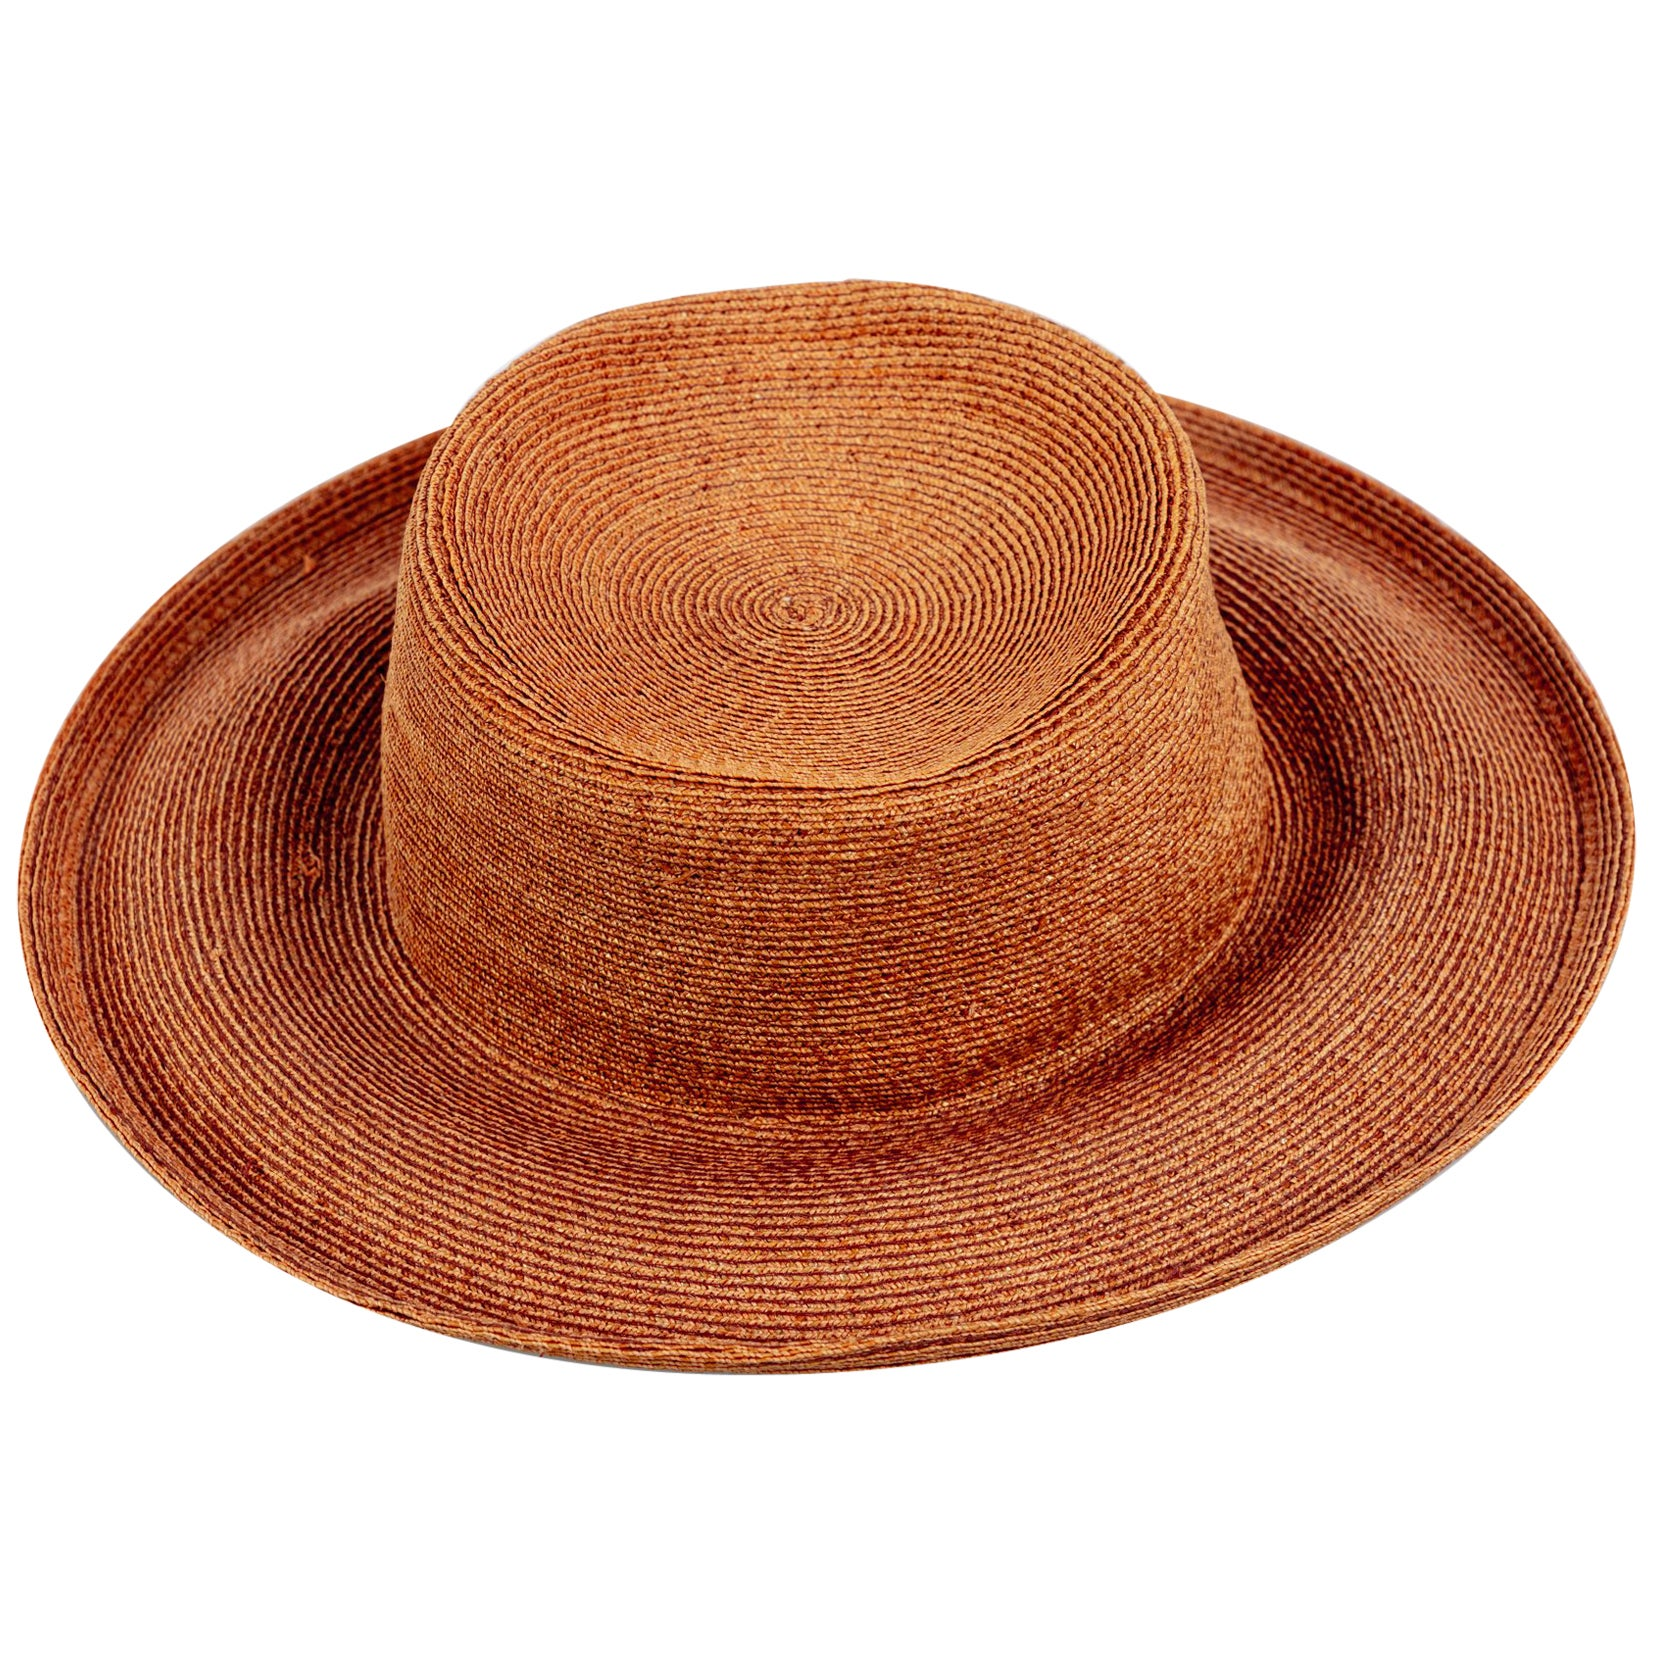 Patricia Underwood Golden Brown Straw Hat, 1990s